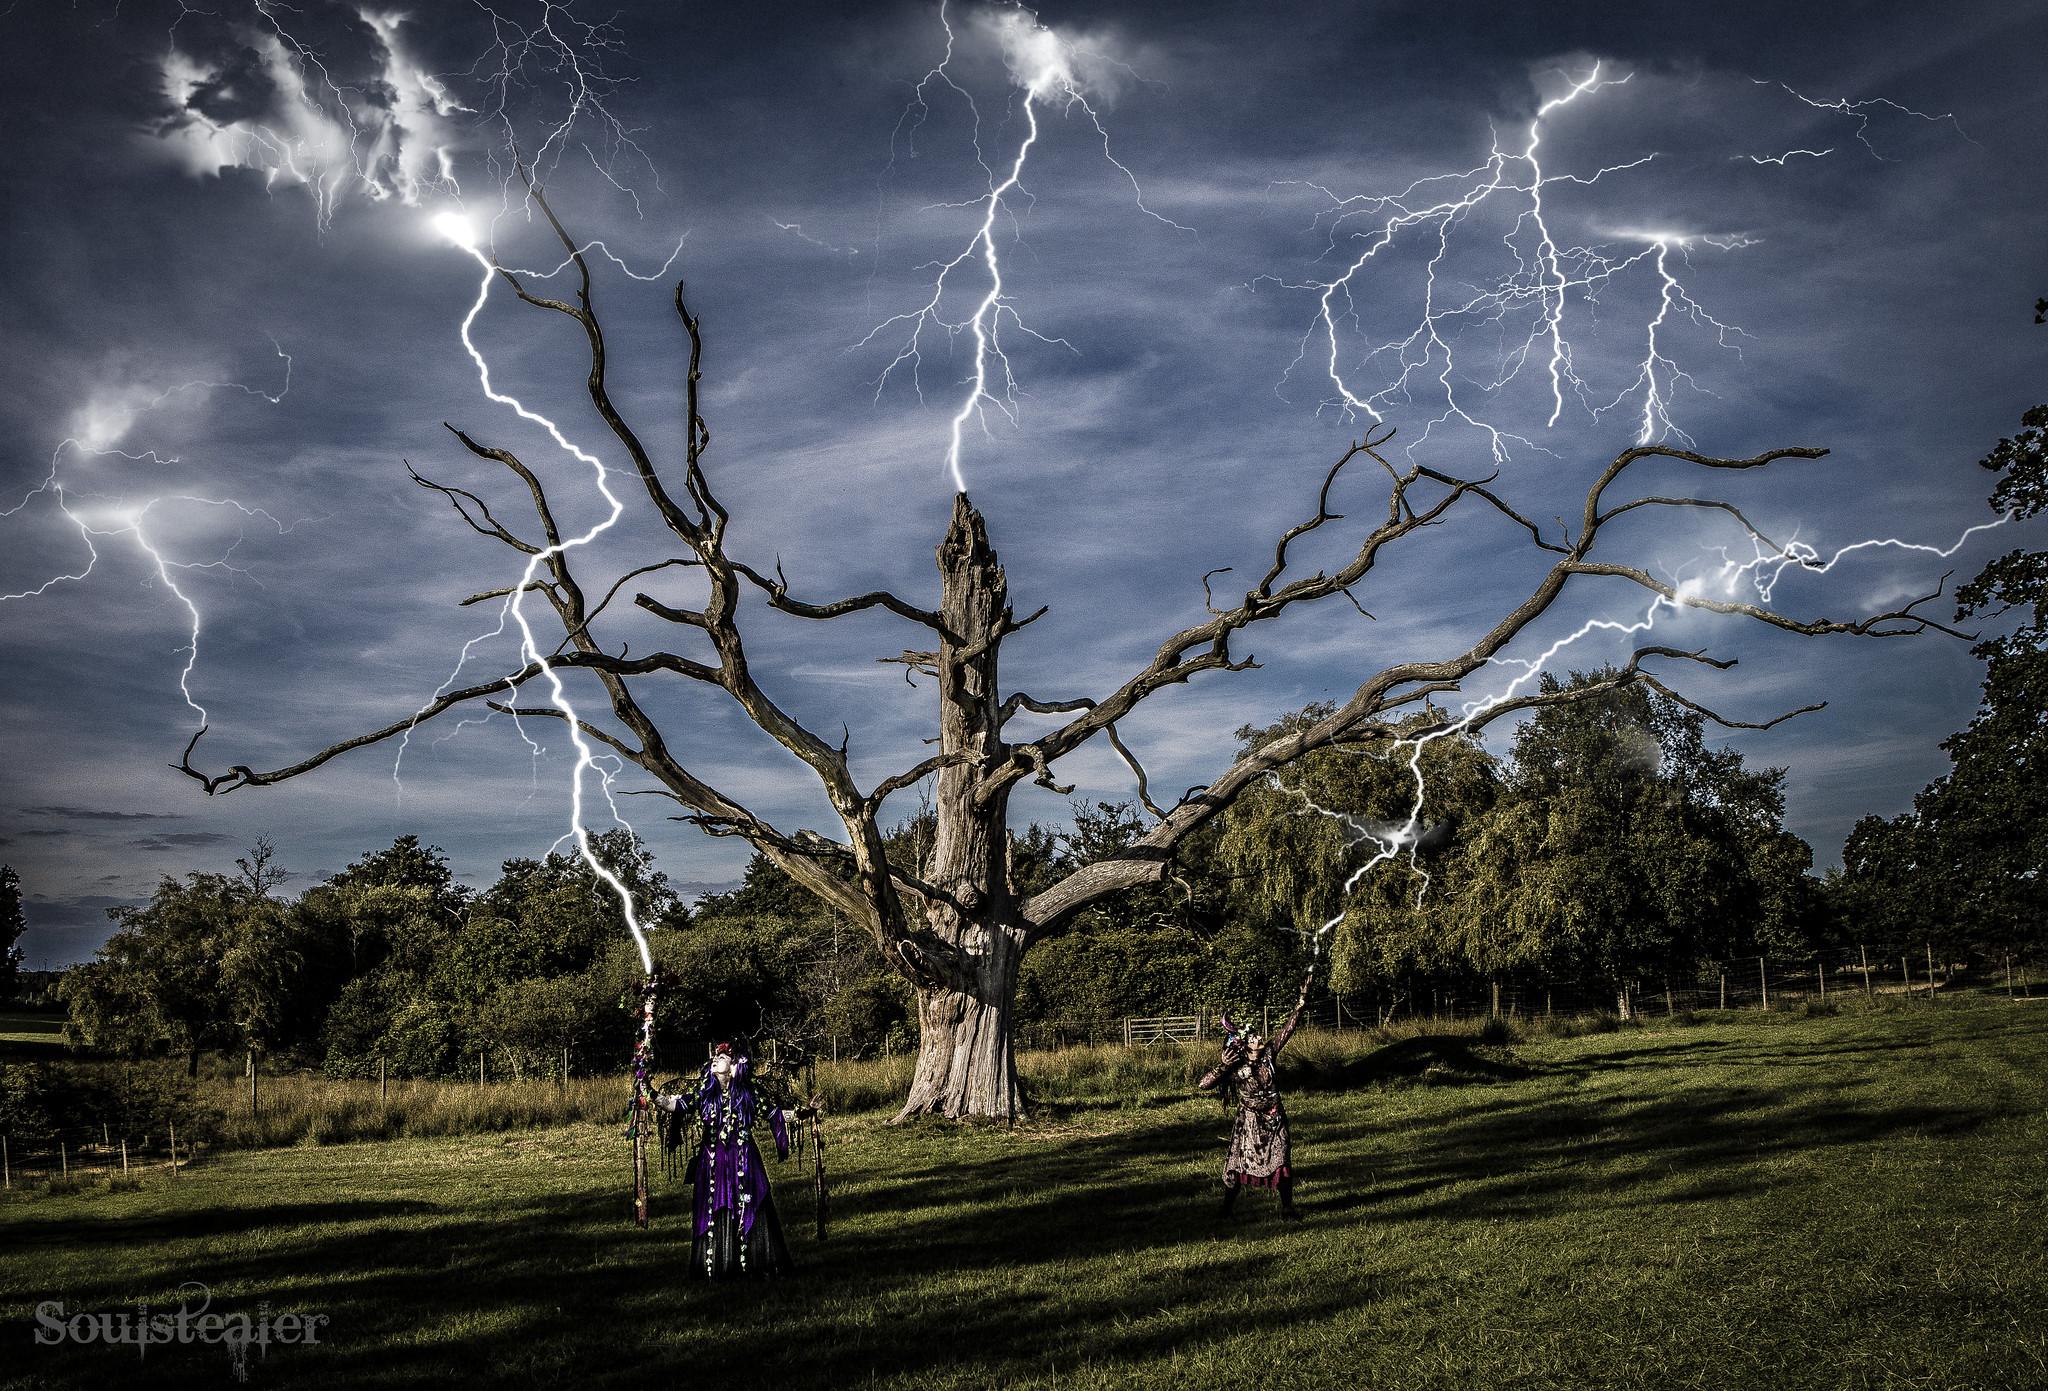 Bring The Lightning!